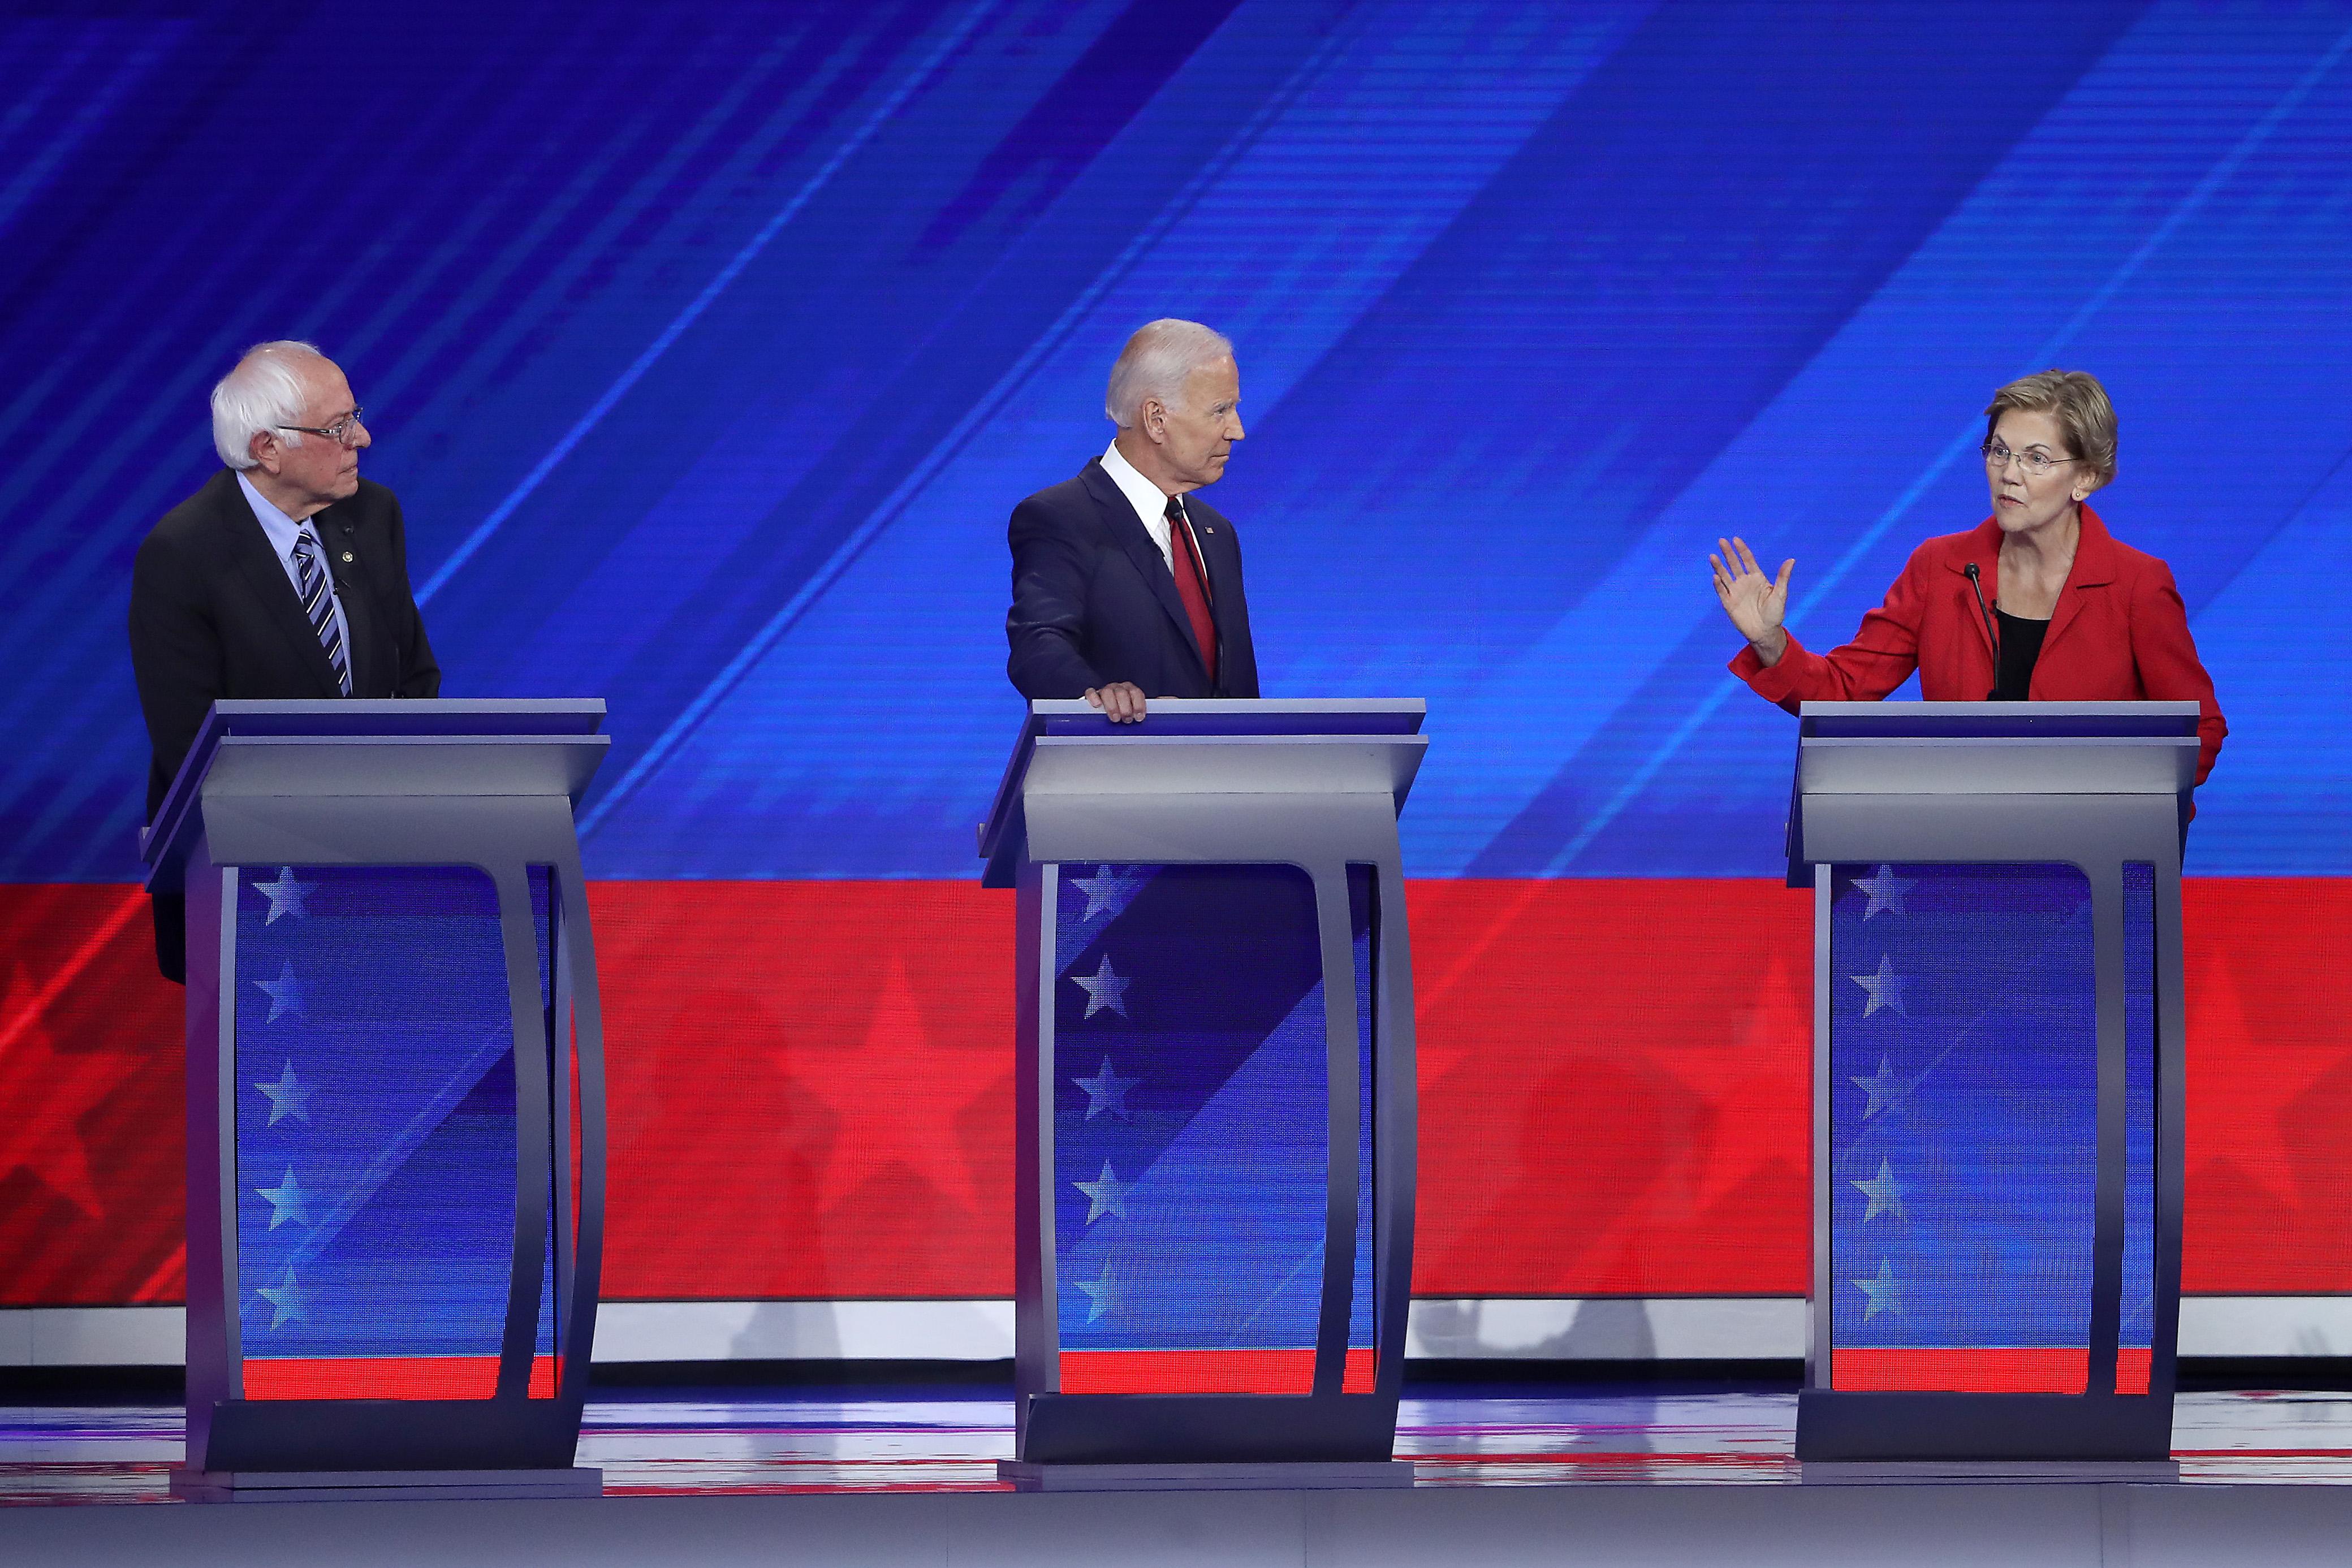 Details for Next Democratic Debate Announced, Ratings for Third Debate Revealed